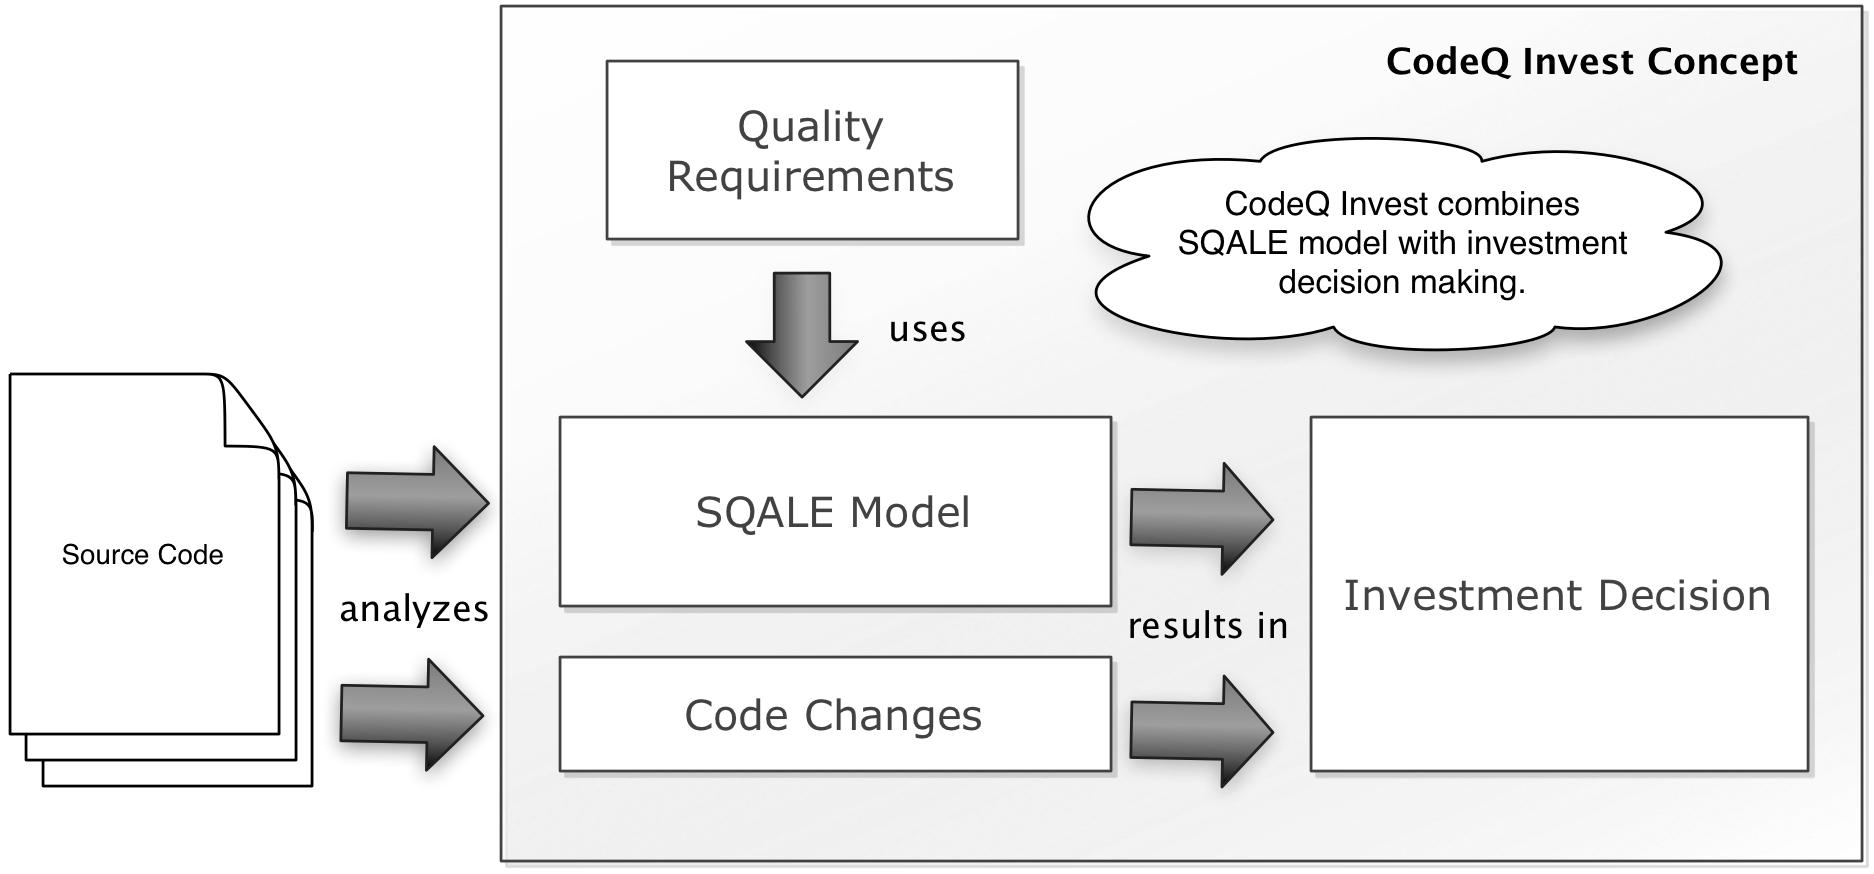 CodeQ Invest concept